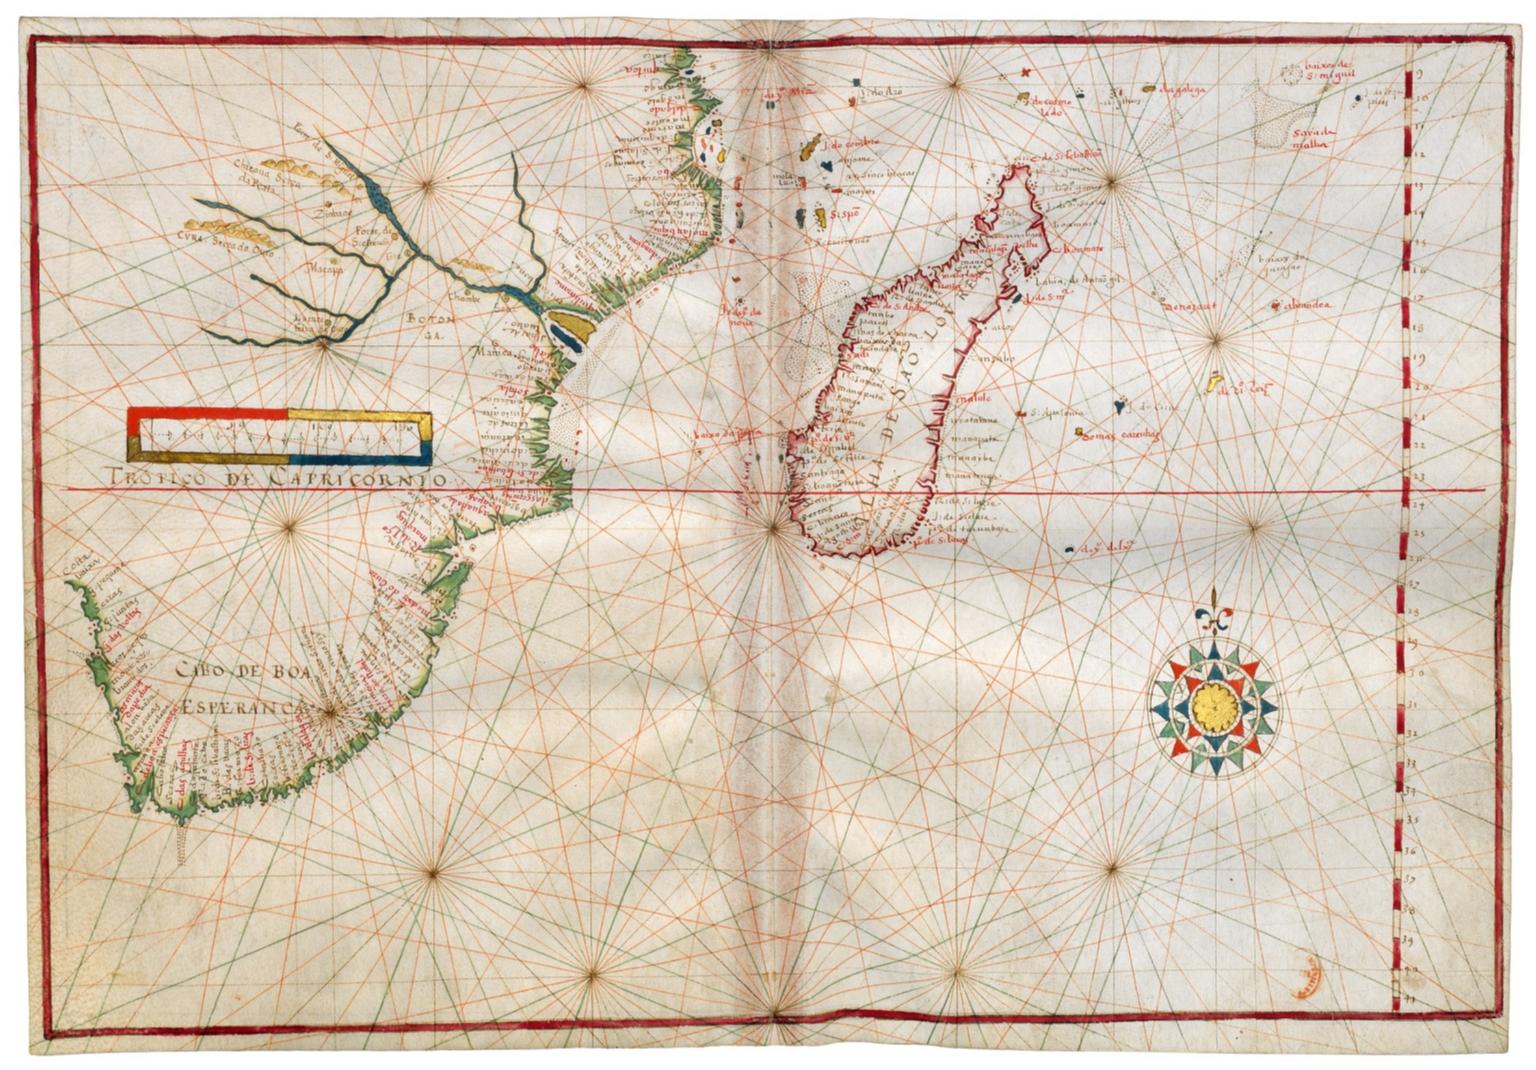 South West Indian Ocean and South East Atlantic Ocean